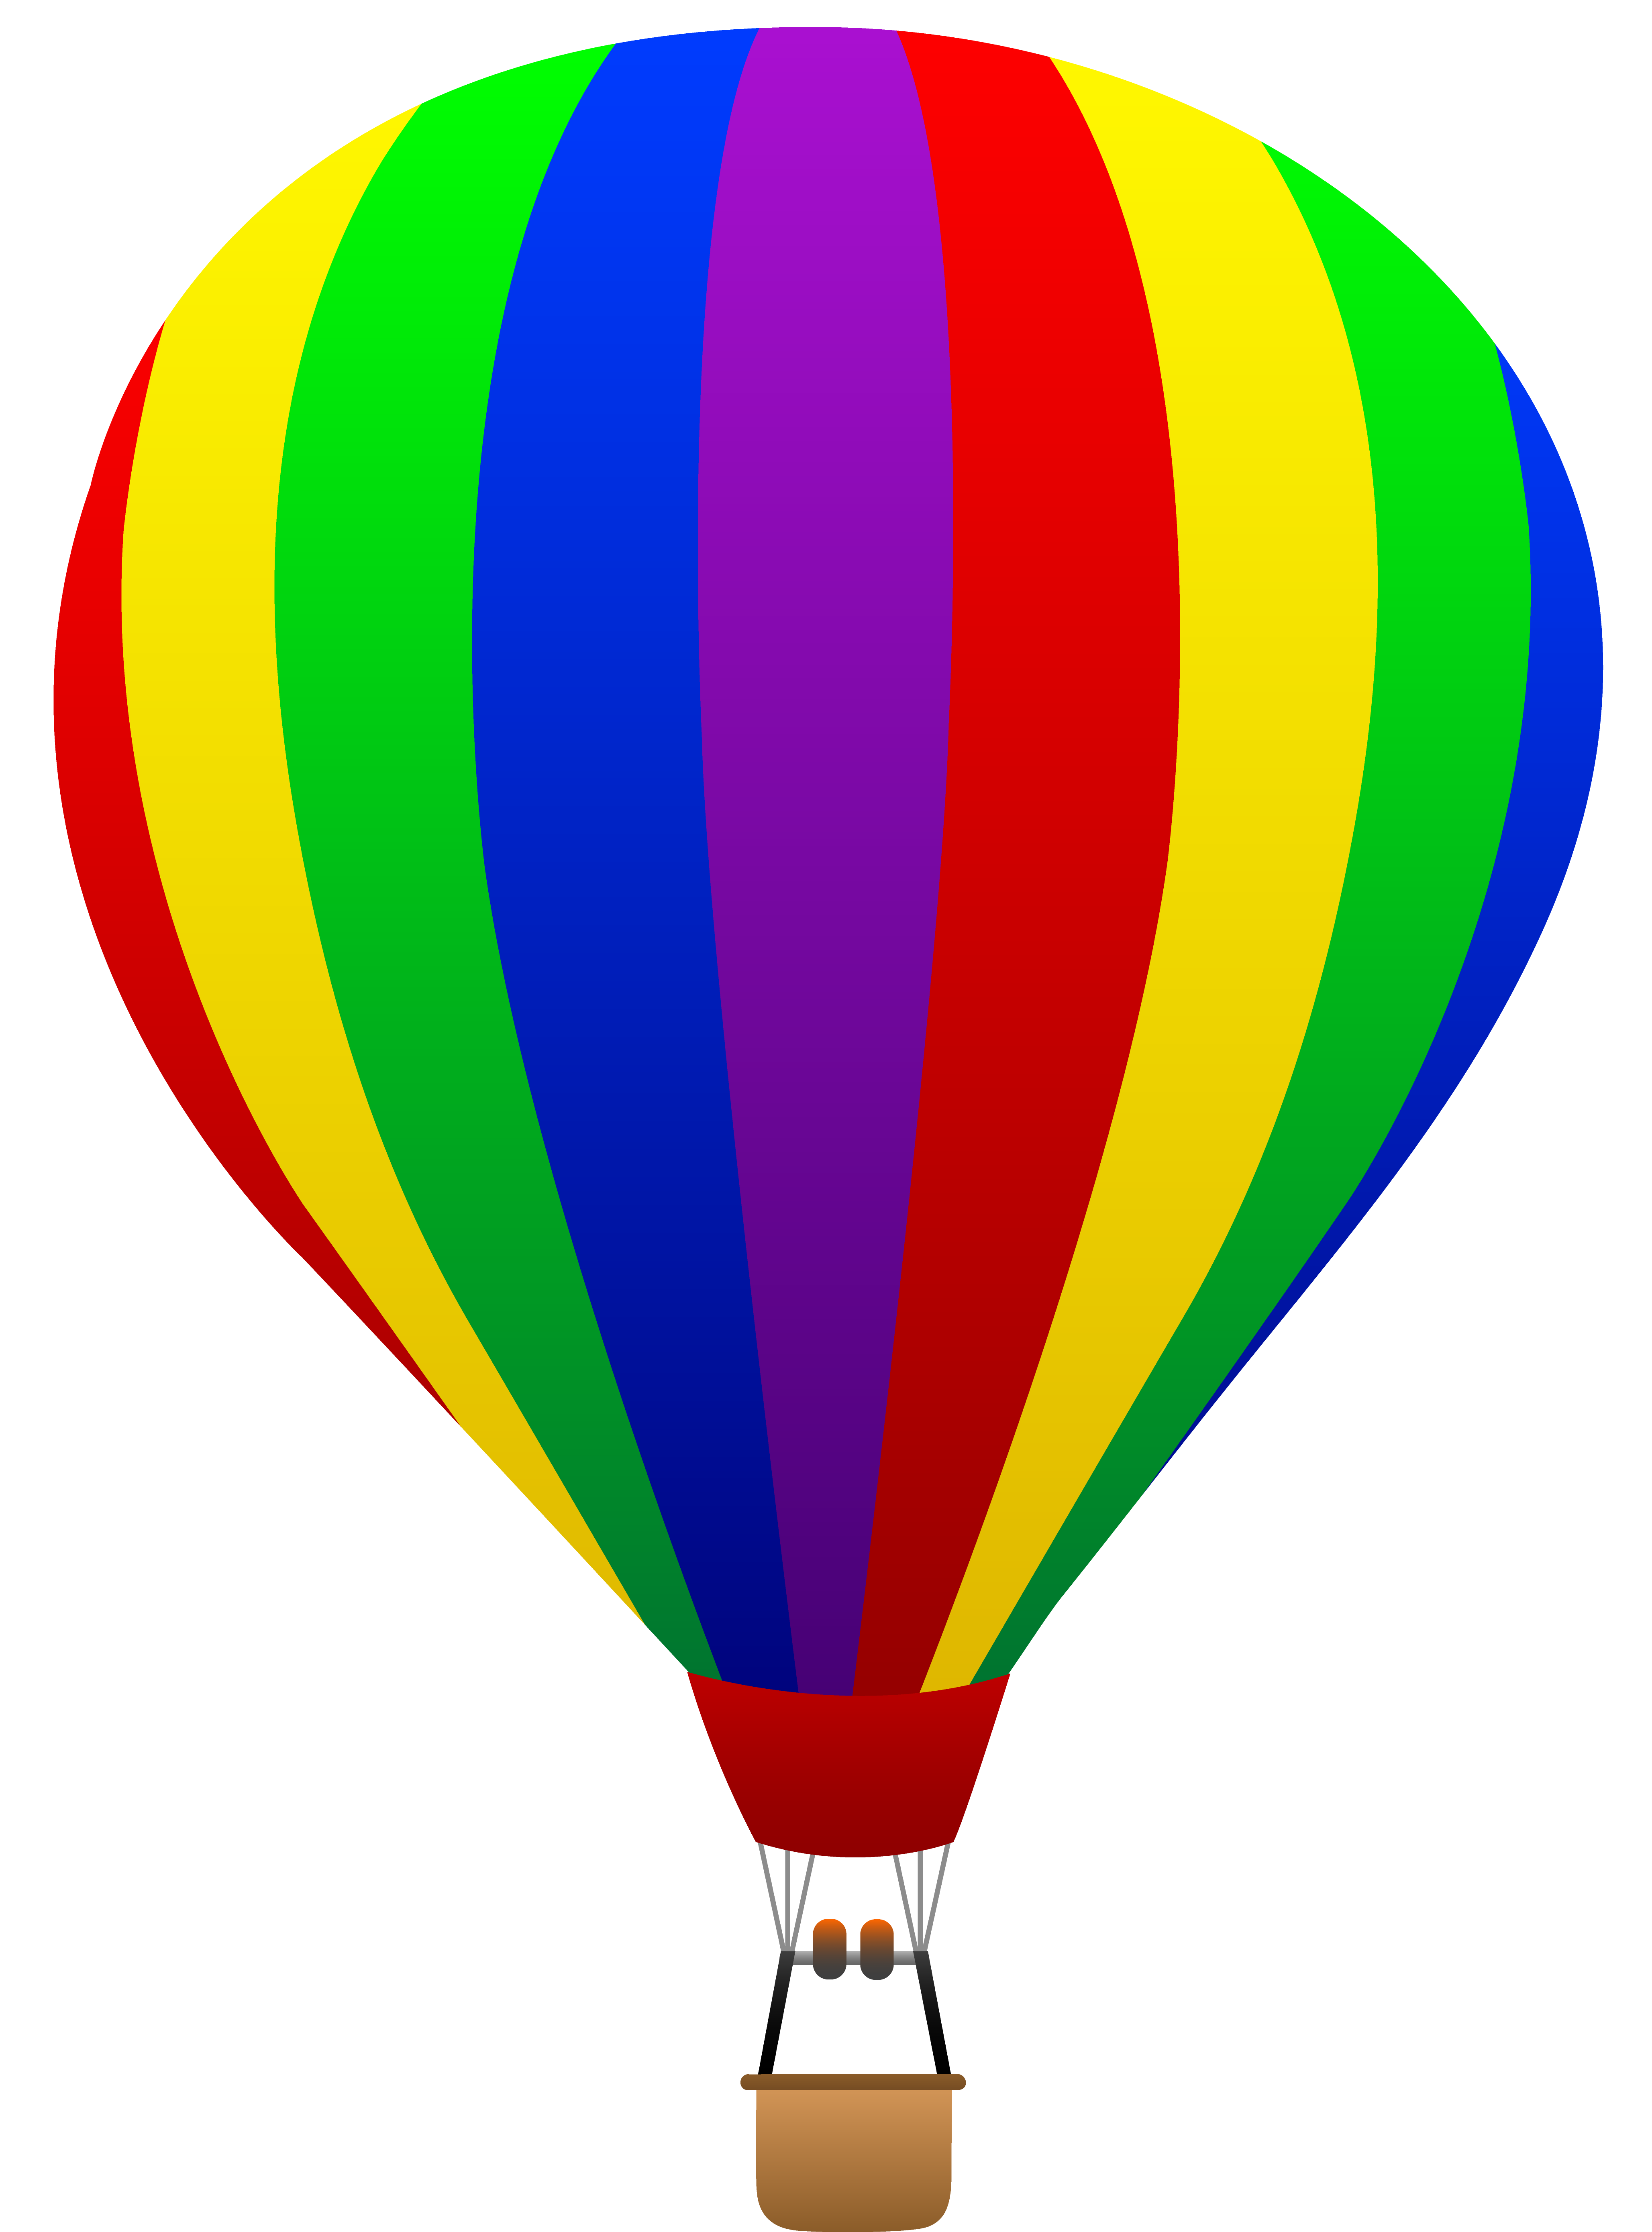 Hot Air Balloon Linen ... Welcome to